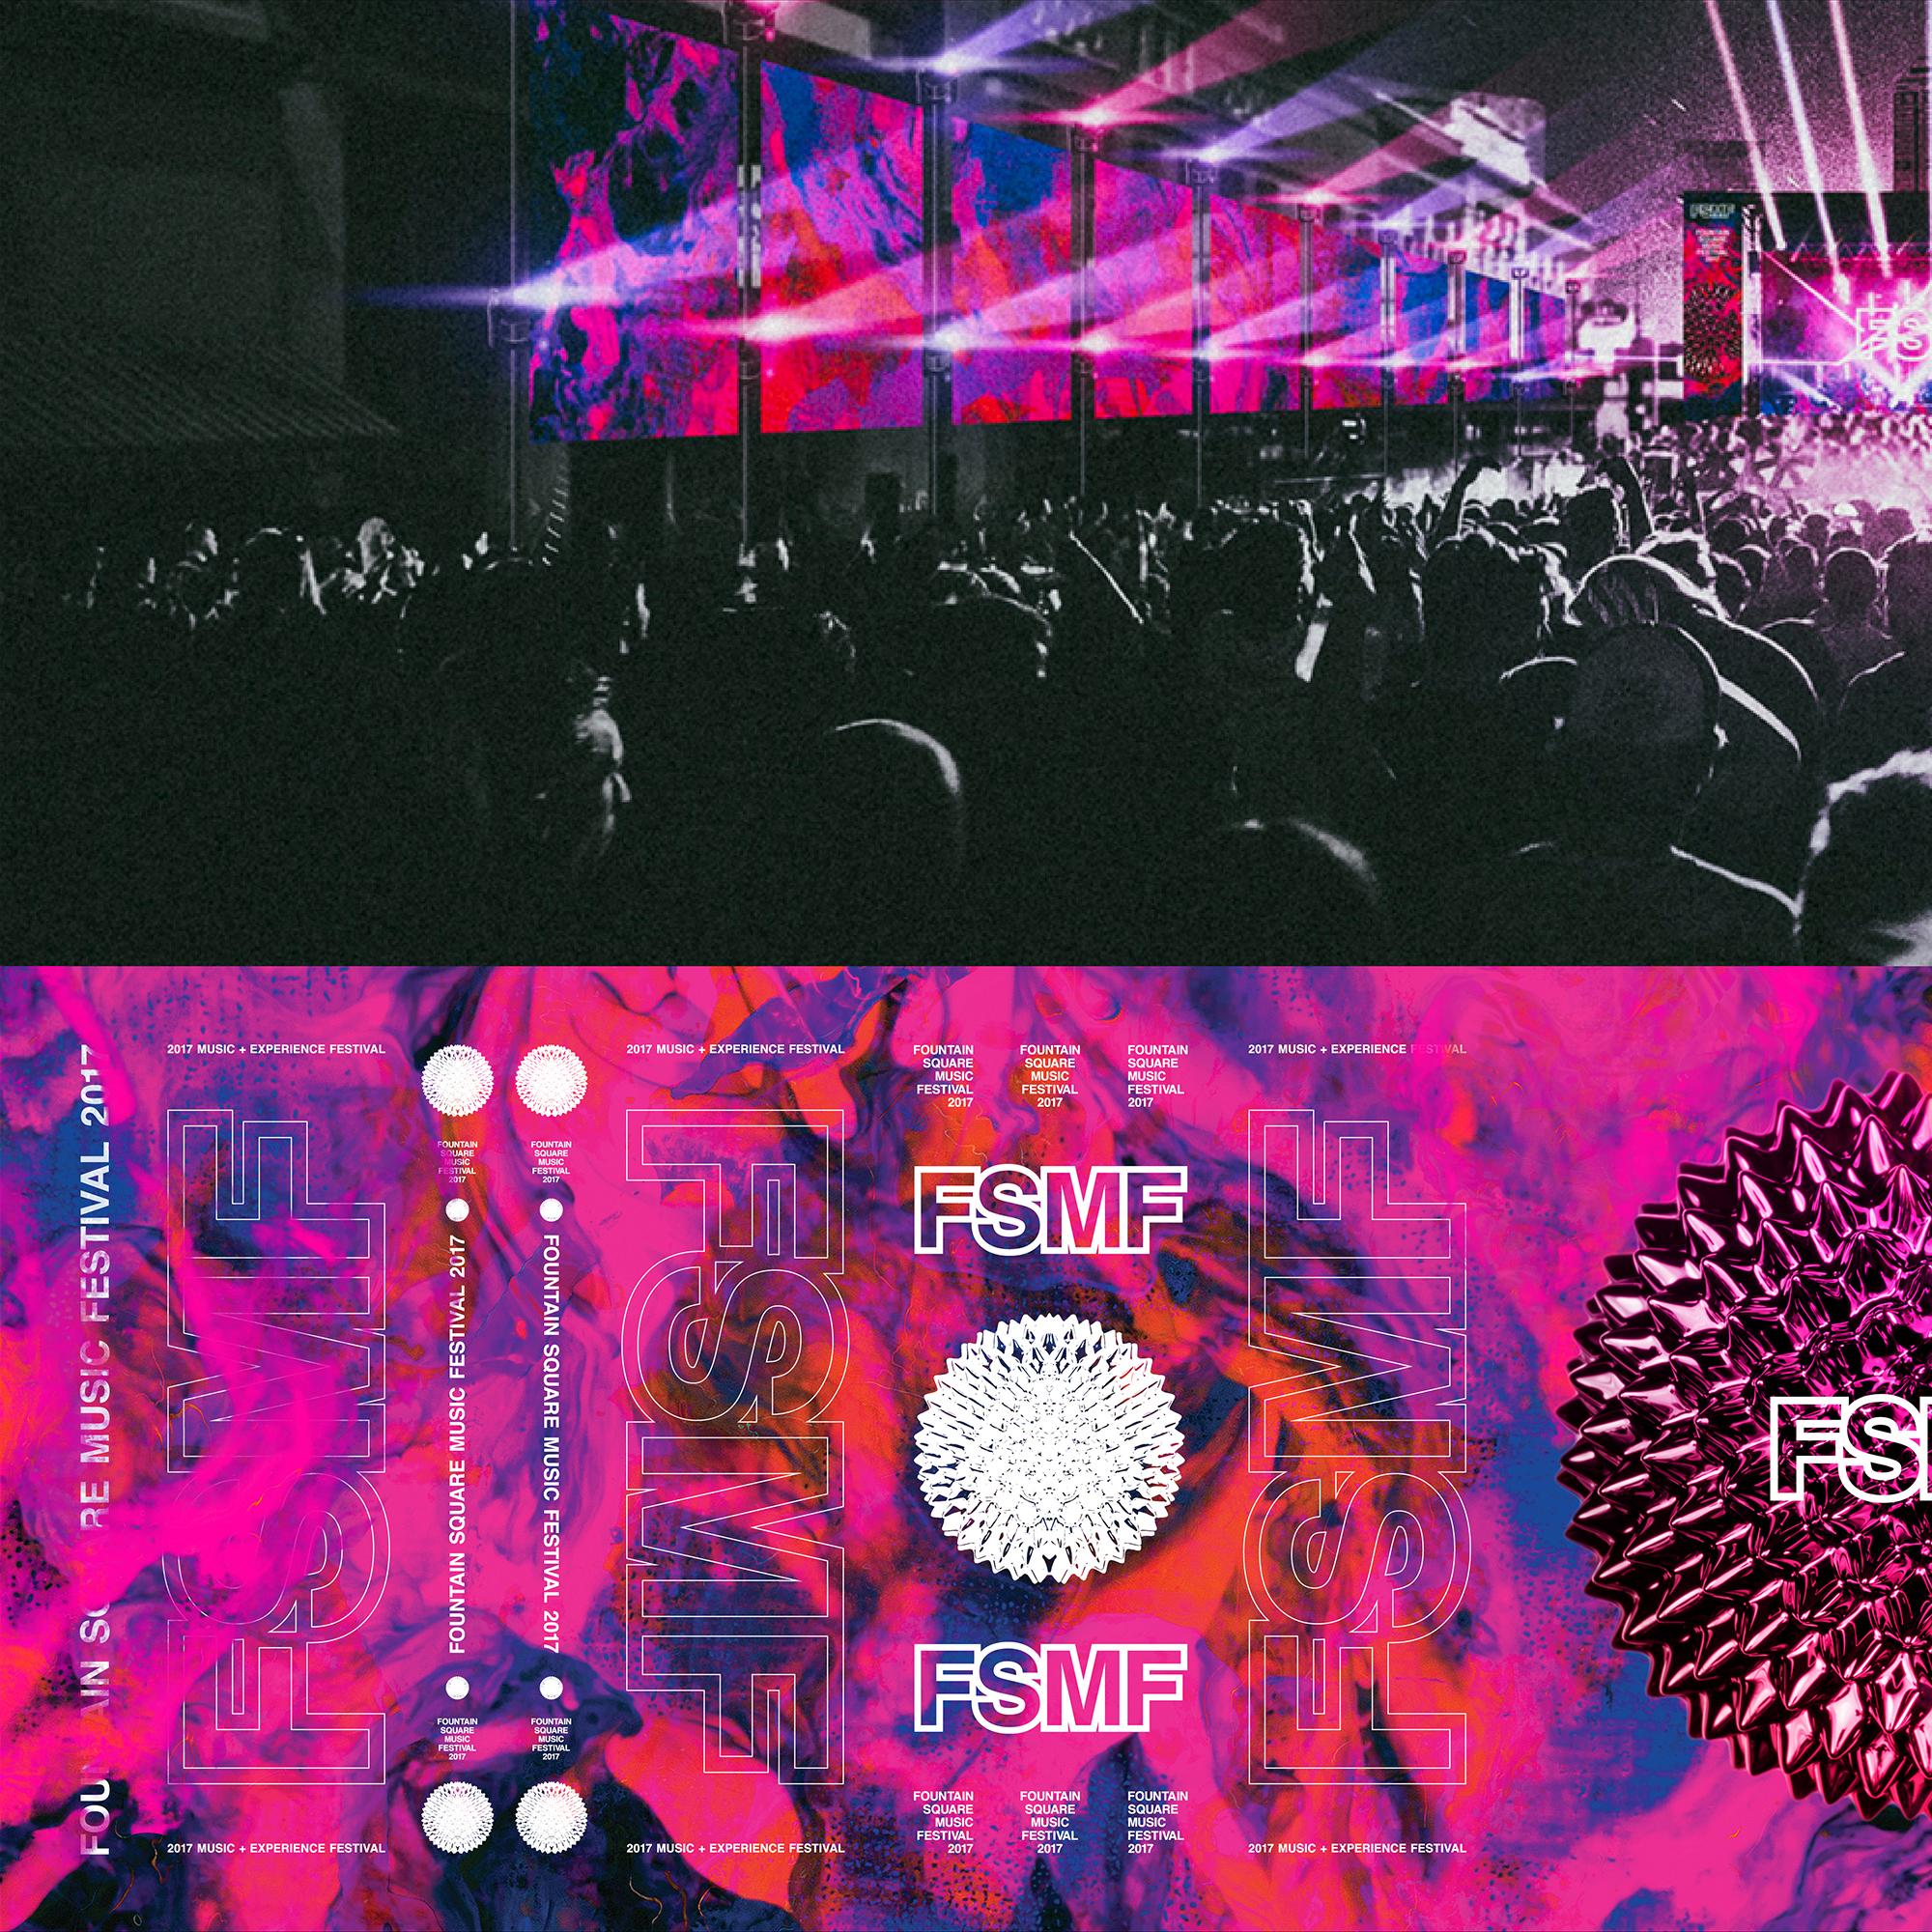 FSMF_2.jpg